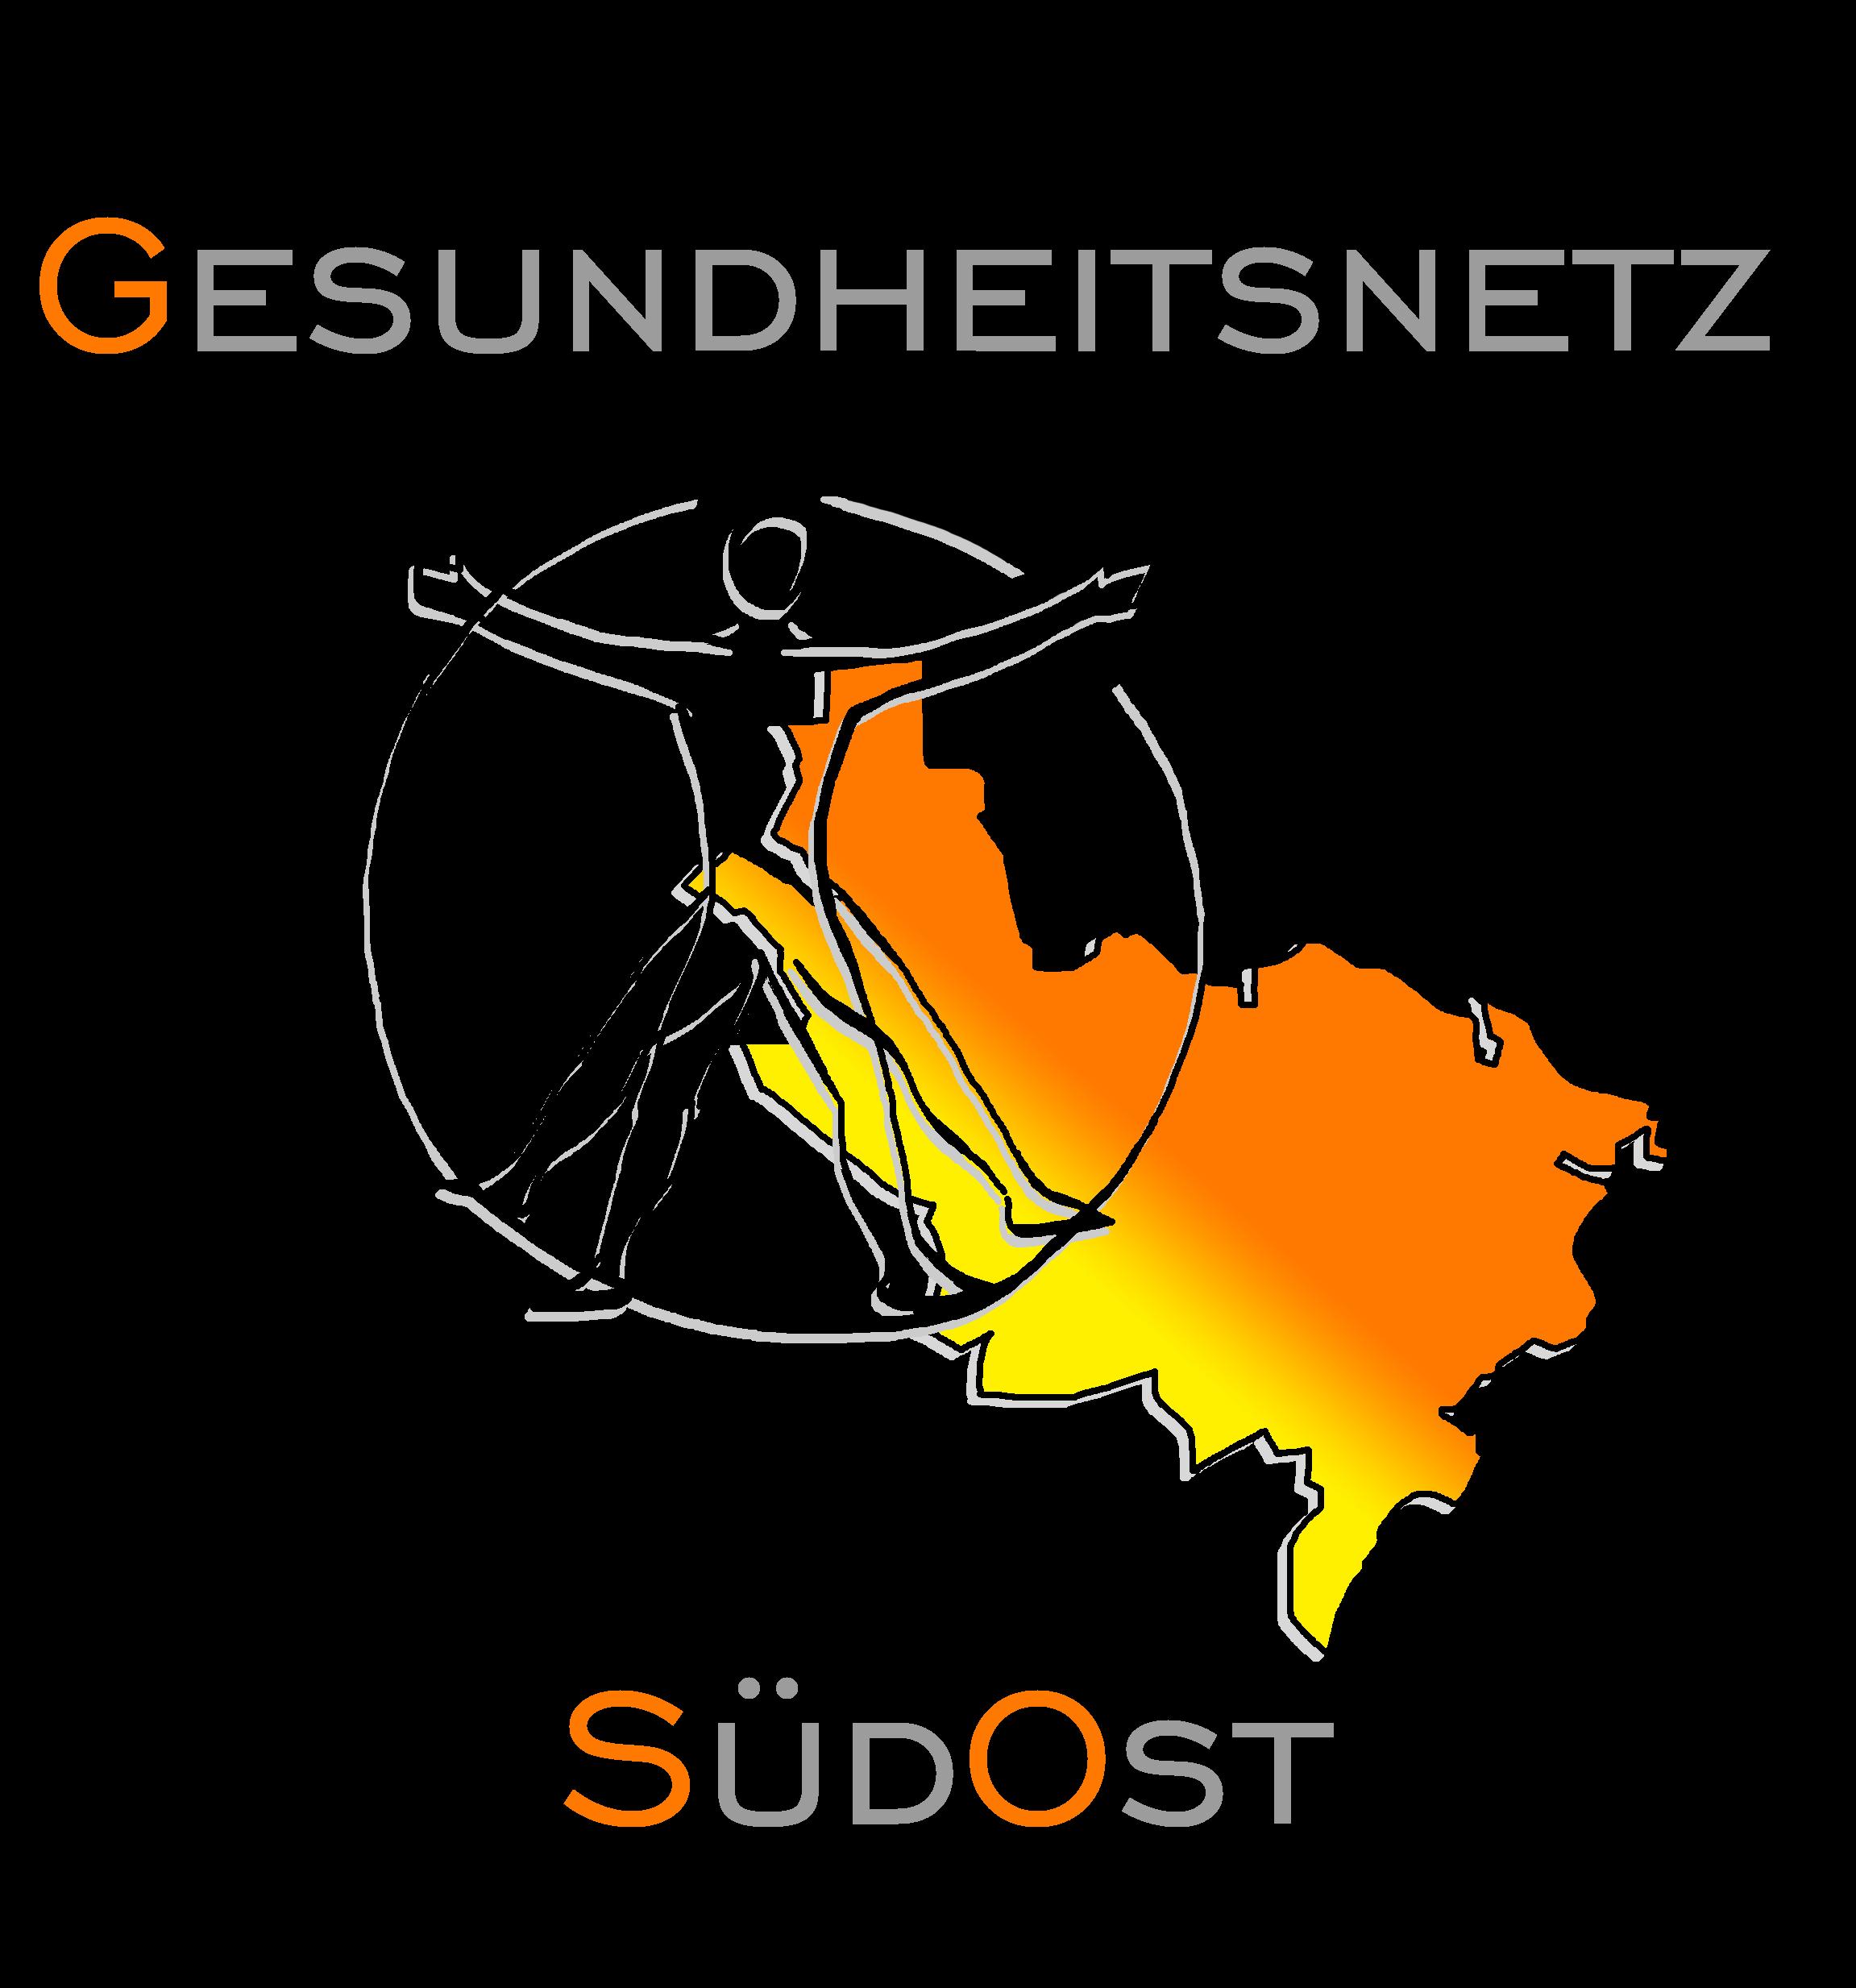 GSO-Berlin